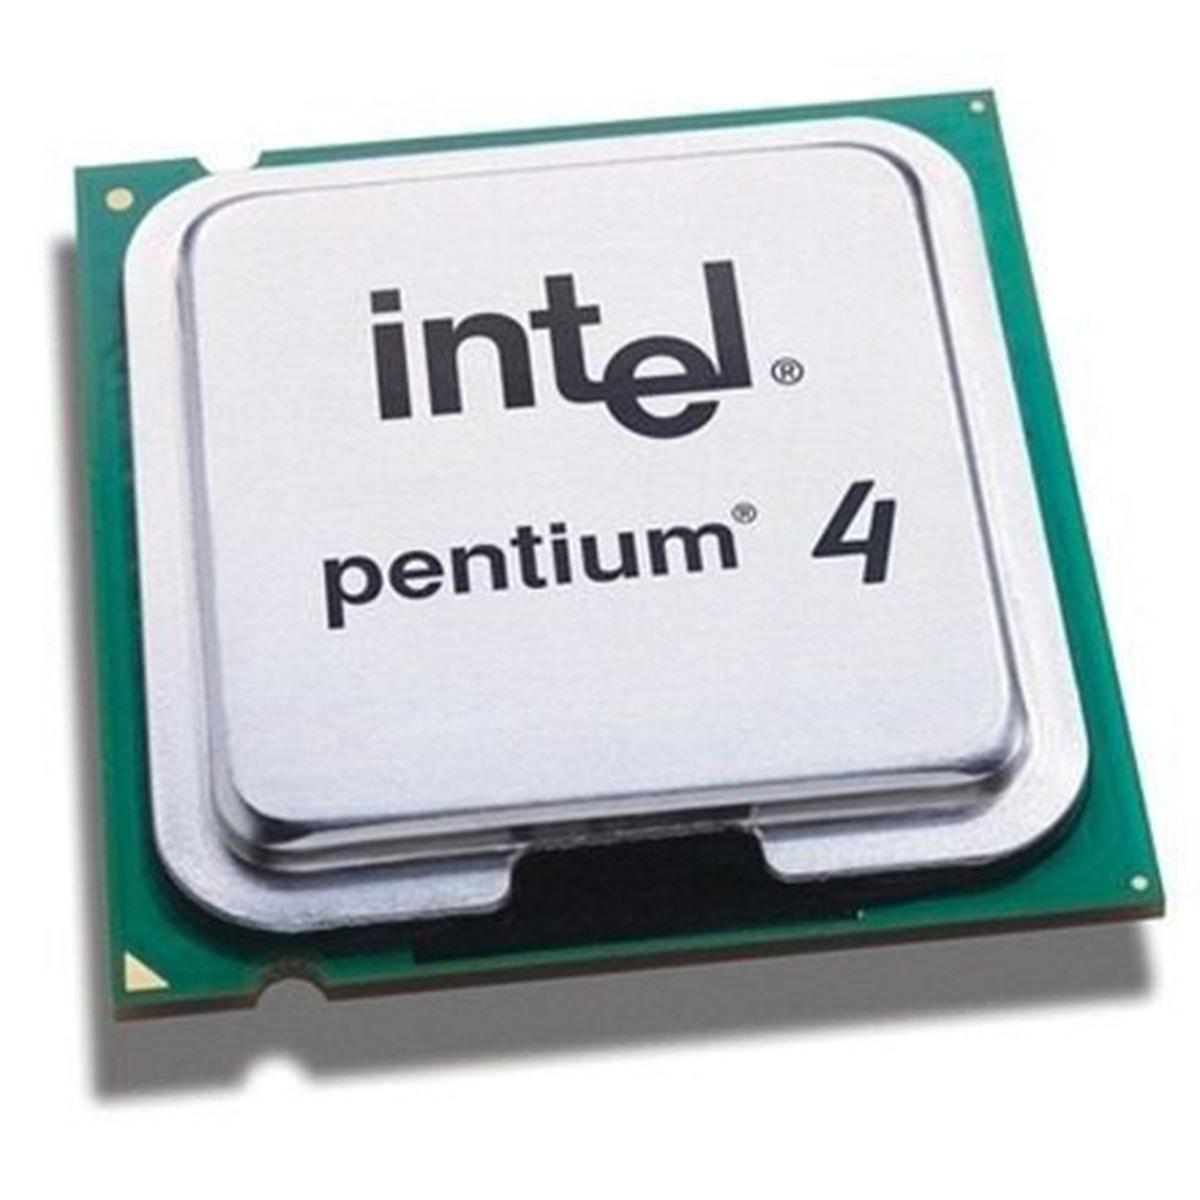 Processador Intel Pentium 4 HT 631 2M Cache / 3.00 GHz / 800 MHz - Socket 775 - Seminovo